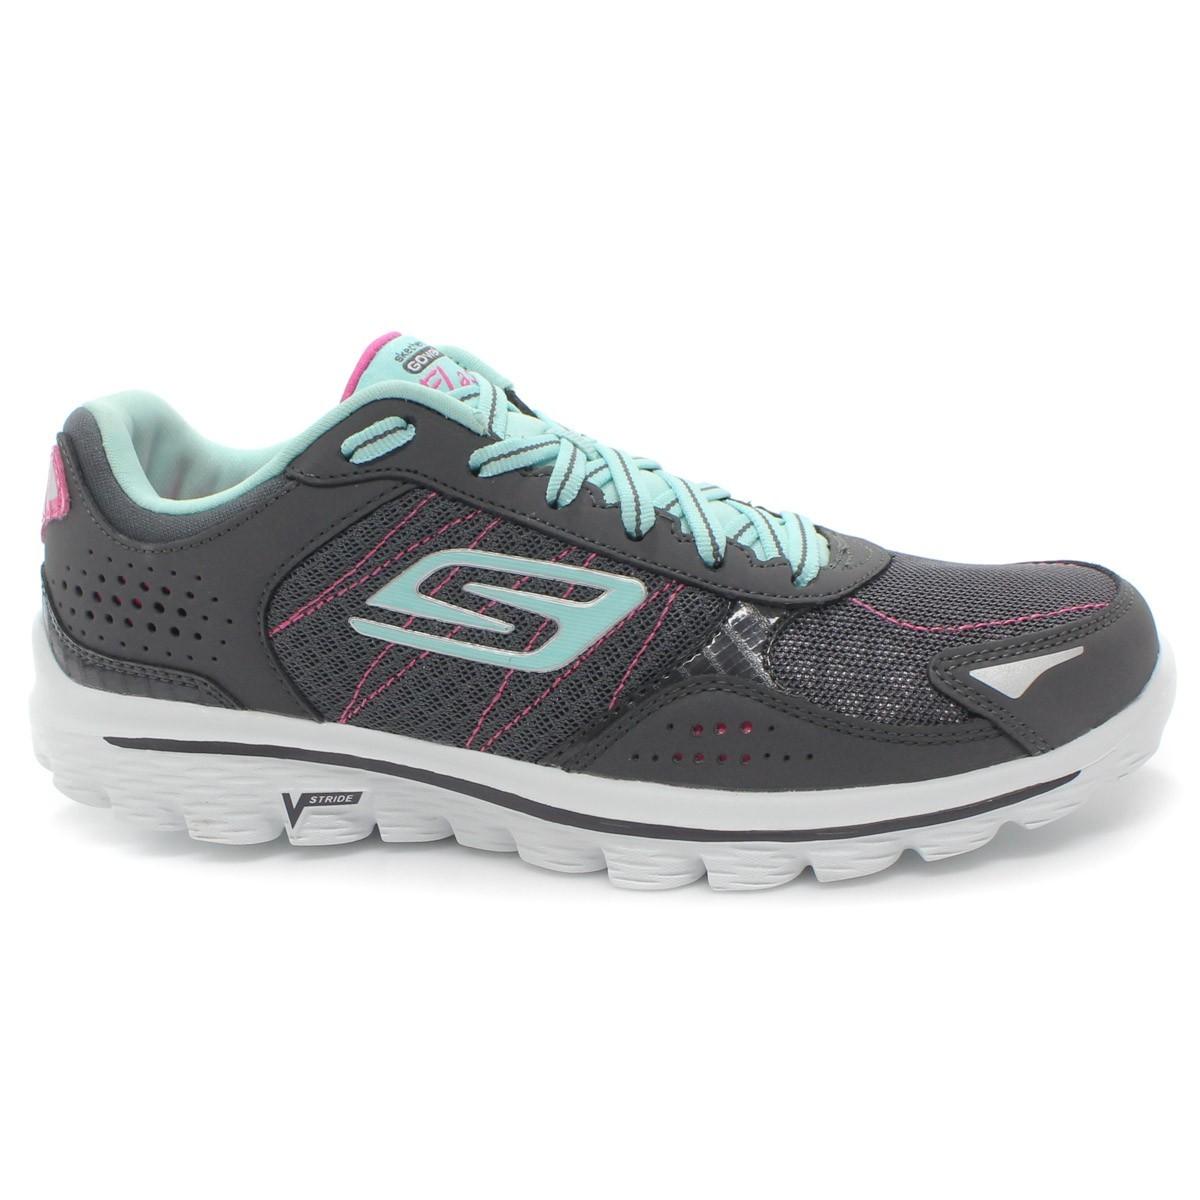 e07530b712 Bizz Store - Tênis Feminino Skechers GO Walk 2 Flash Corrida